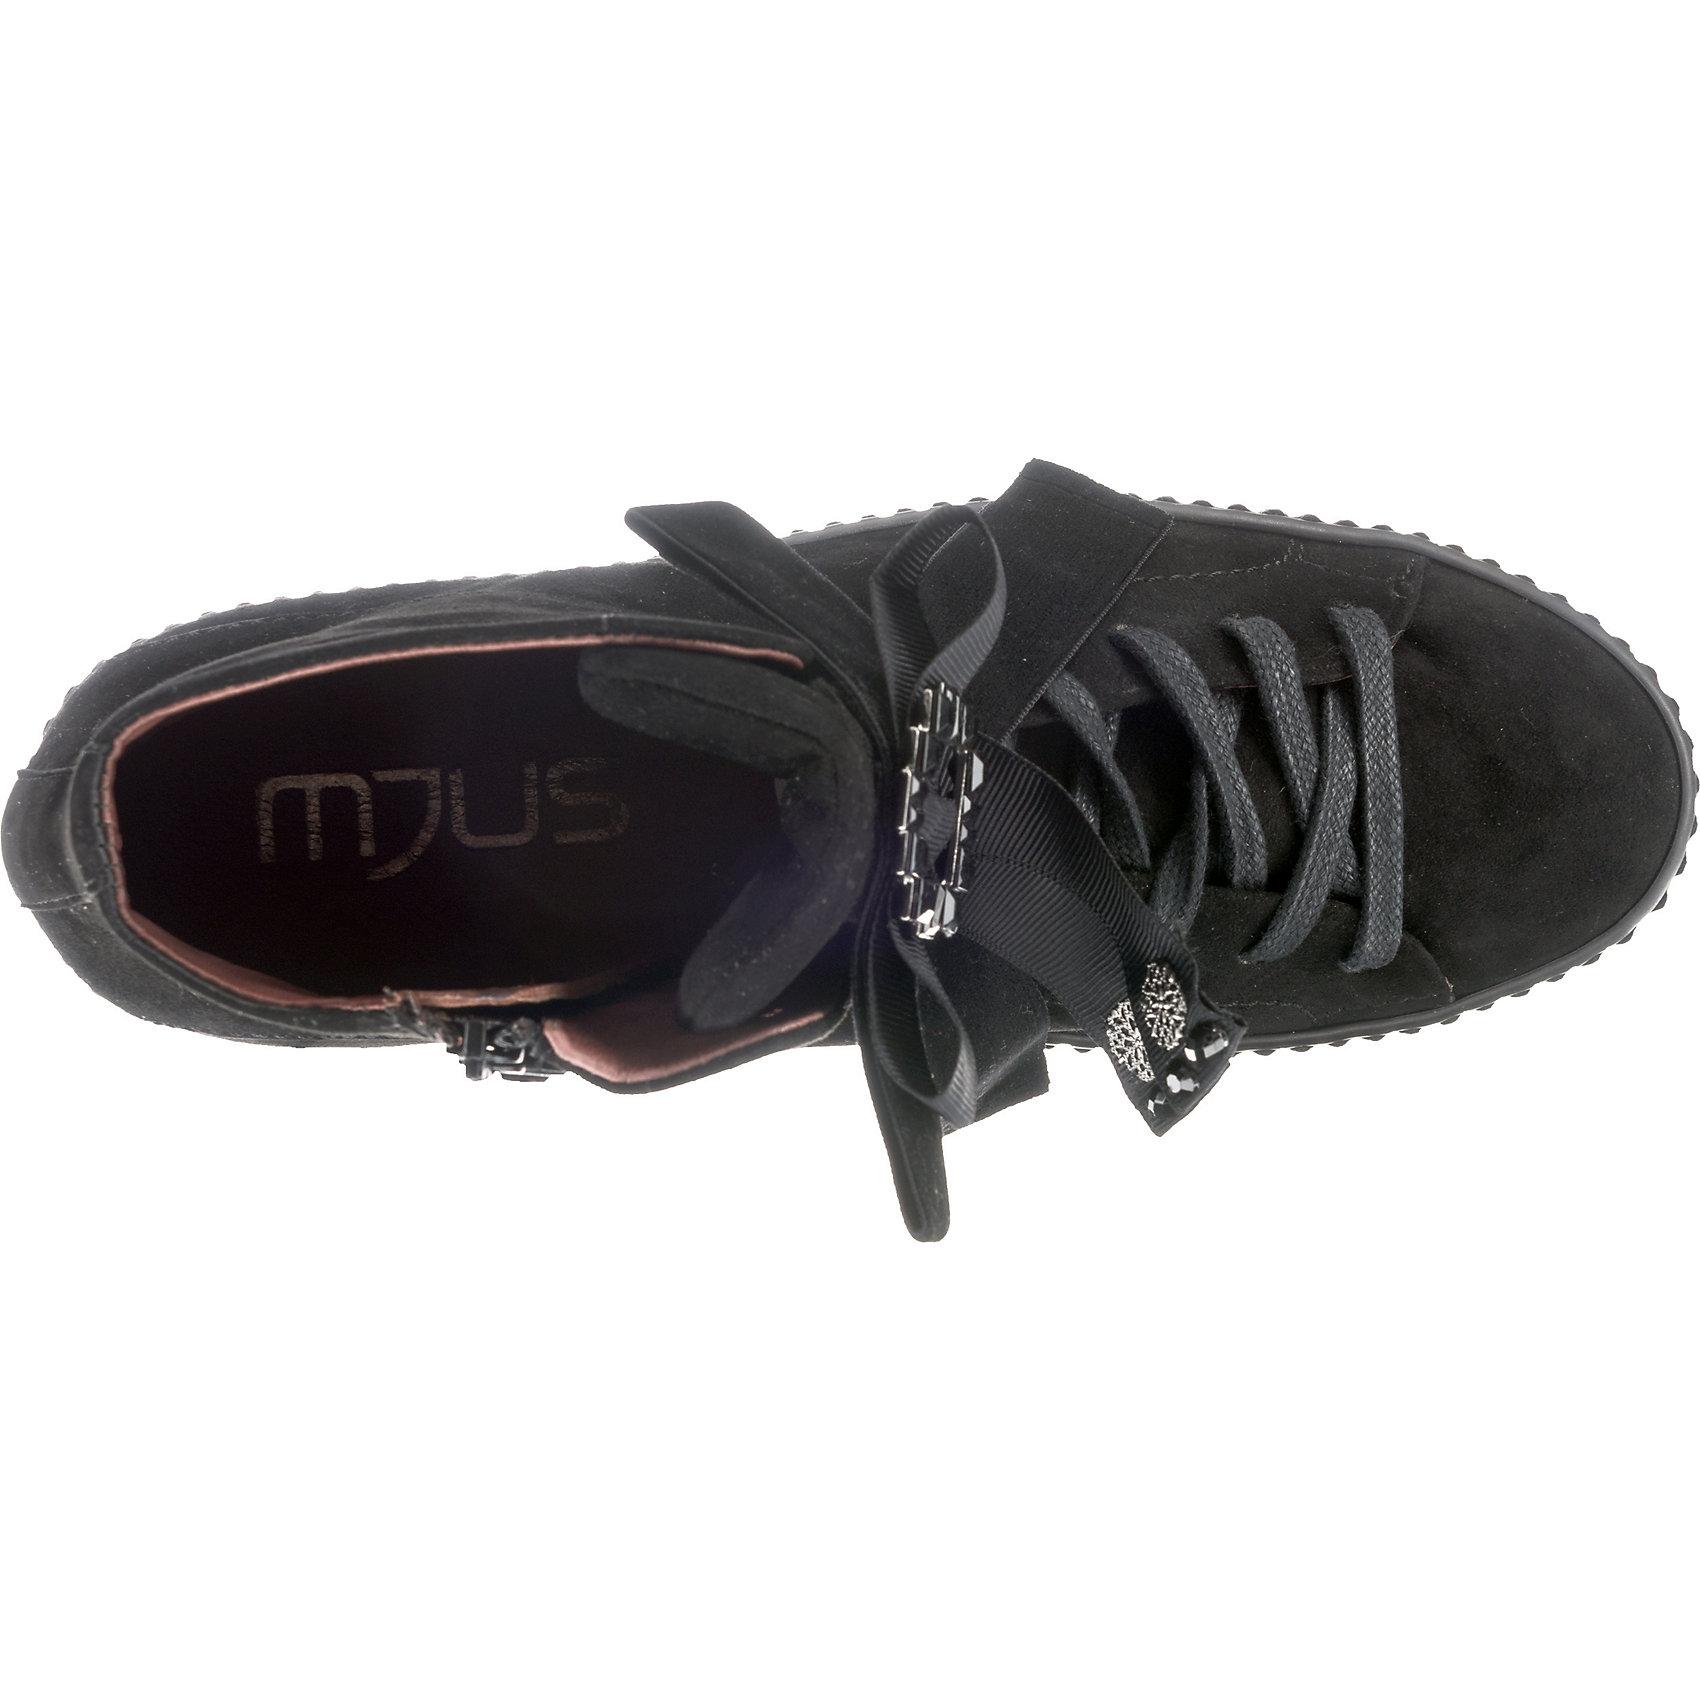 buy popular e67d3 74194 ... Nike Jordan Air Air Air Franchise Men s Shoes Size 12 Black 881472 011  NEW In Box ...